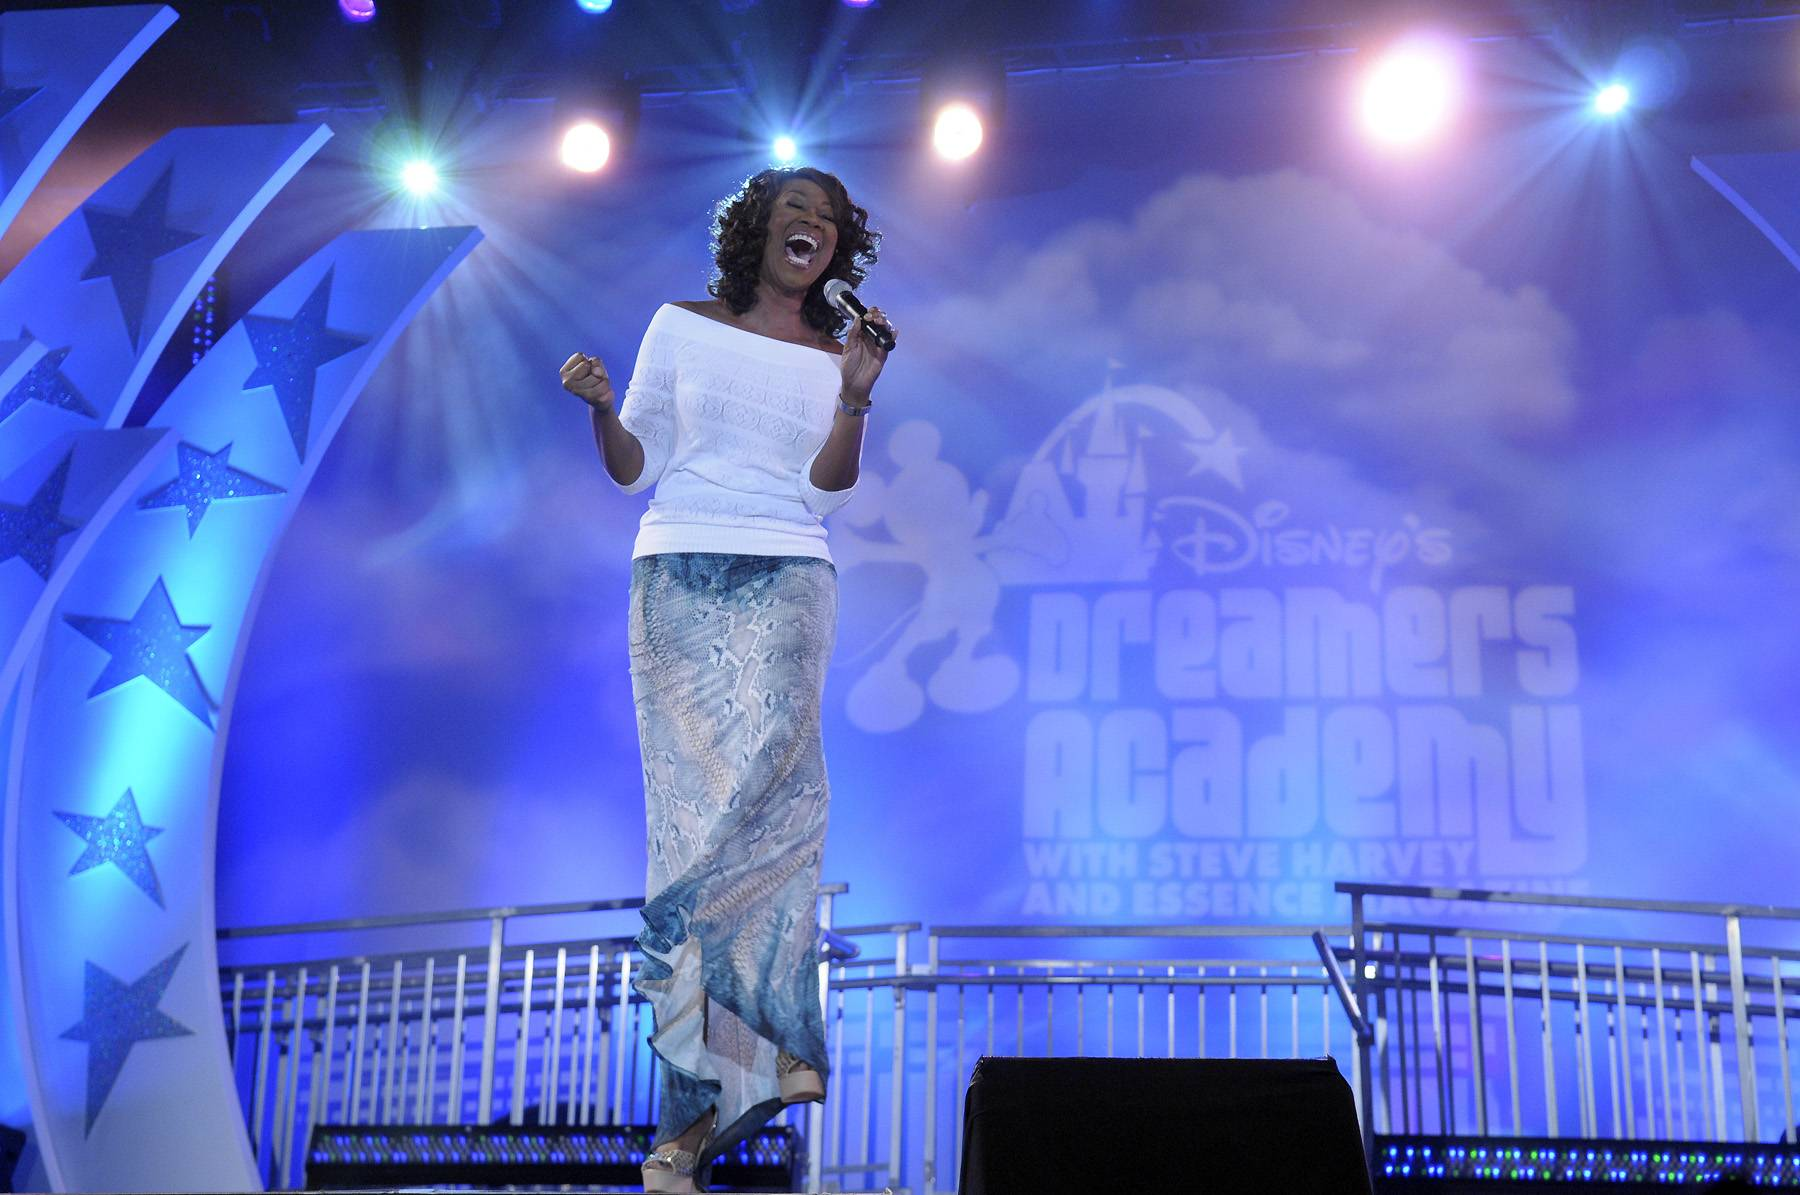 Uplifting Voice - Gospel singer Yolada Adams closed the Dreamers Academy on March 11 with a stirring performance.(Photo: Phelan Ebenhack)